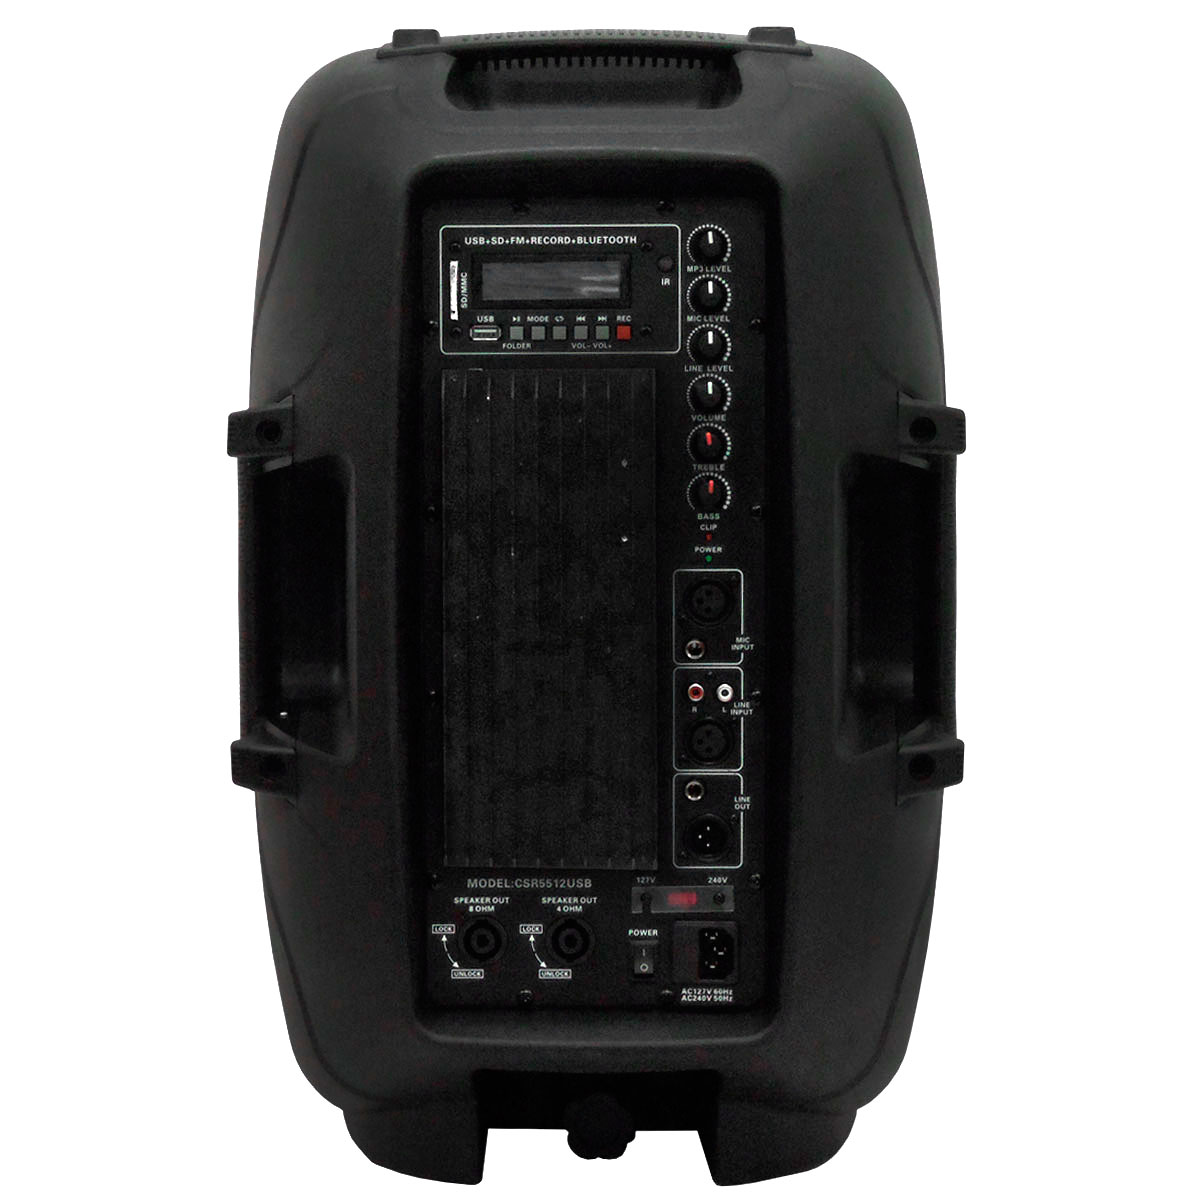 Caixa Ativa Fal 12 Pol 200W c/ USB / Bluetooth - CSR 5512 USB BT